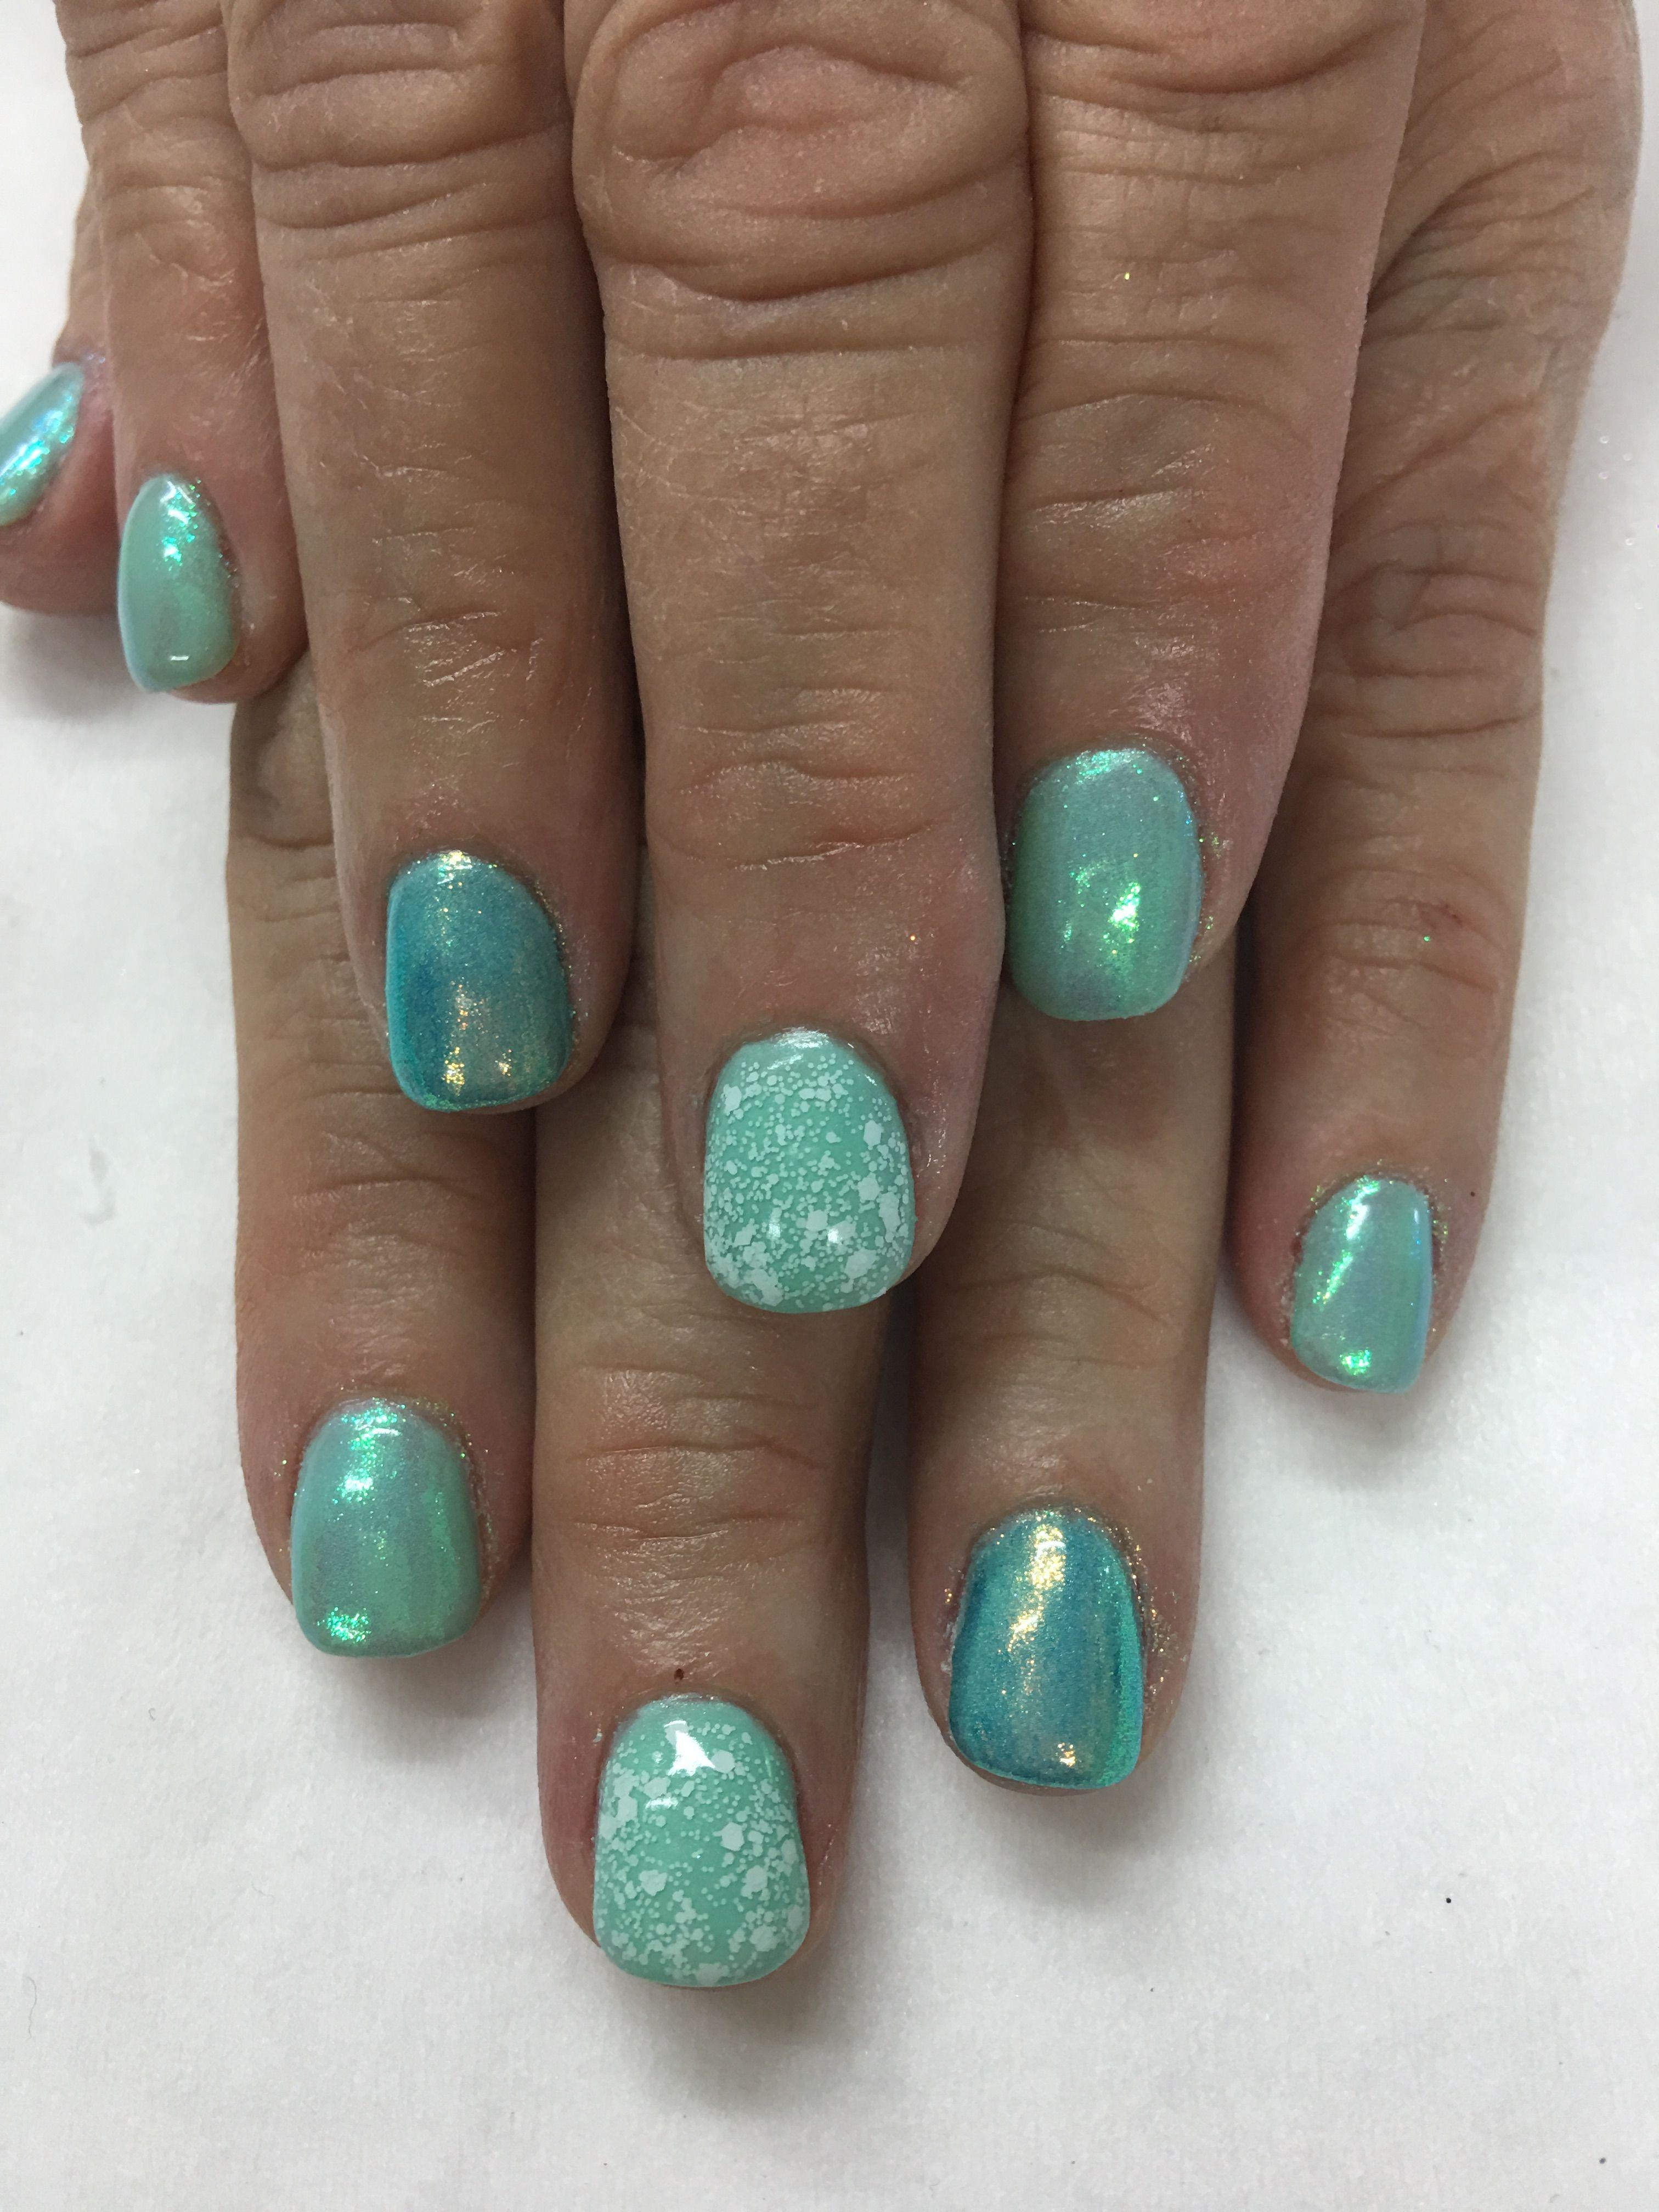 Mint 2 color Magpie Jade Mermaid Indigo Emerald Unicorn Effect ...